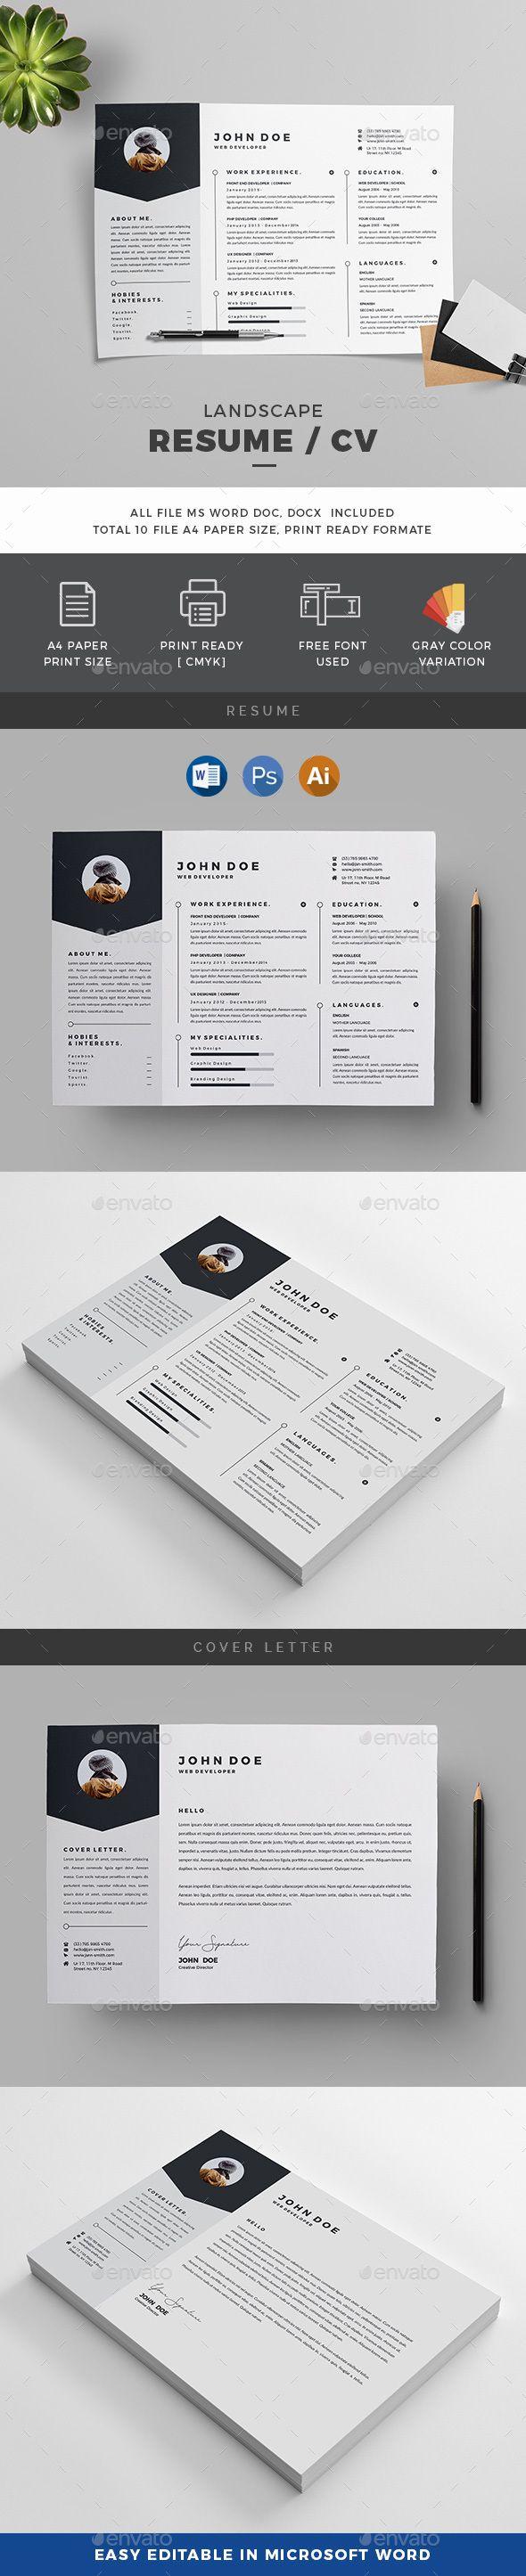 Landscape Resume | Pinterest | Template, Ai illustrator and Cv template